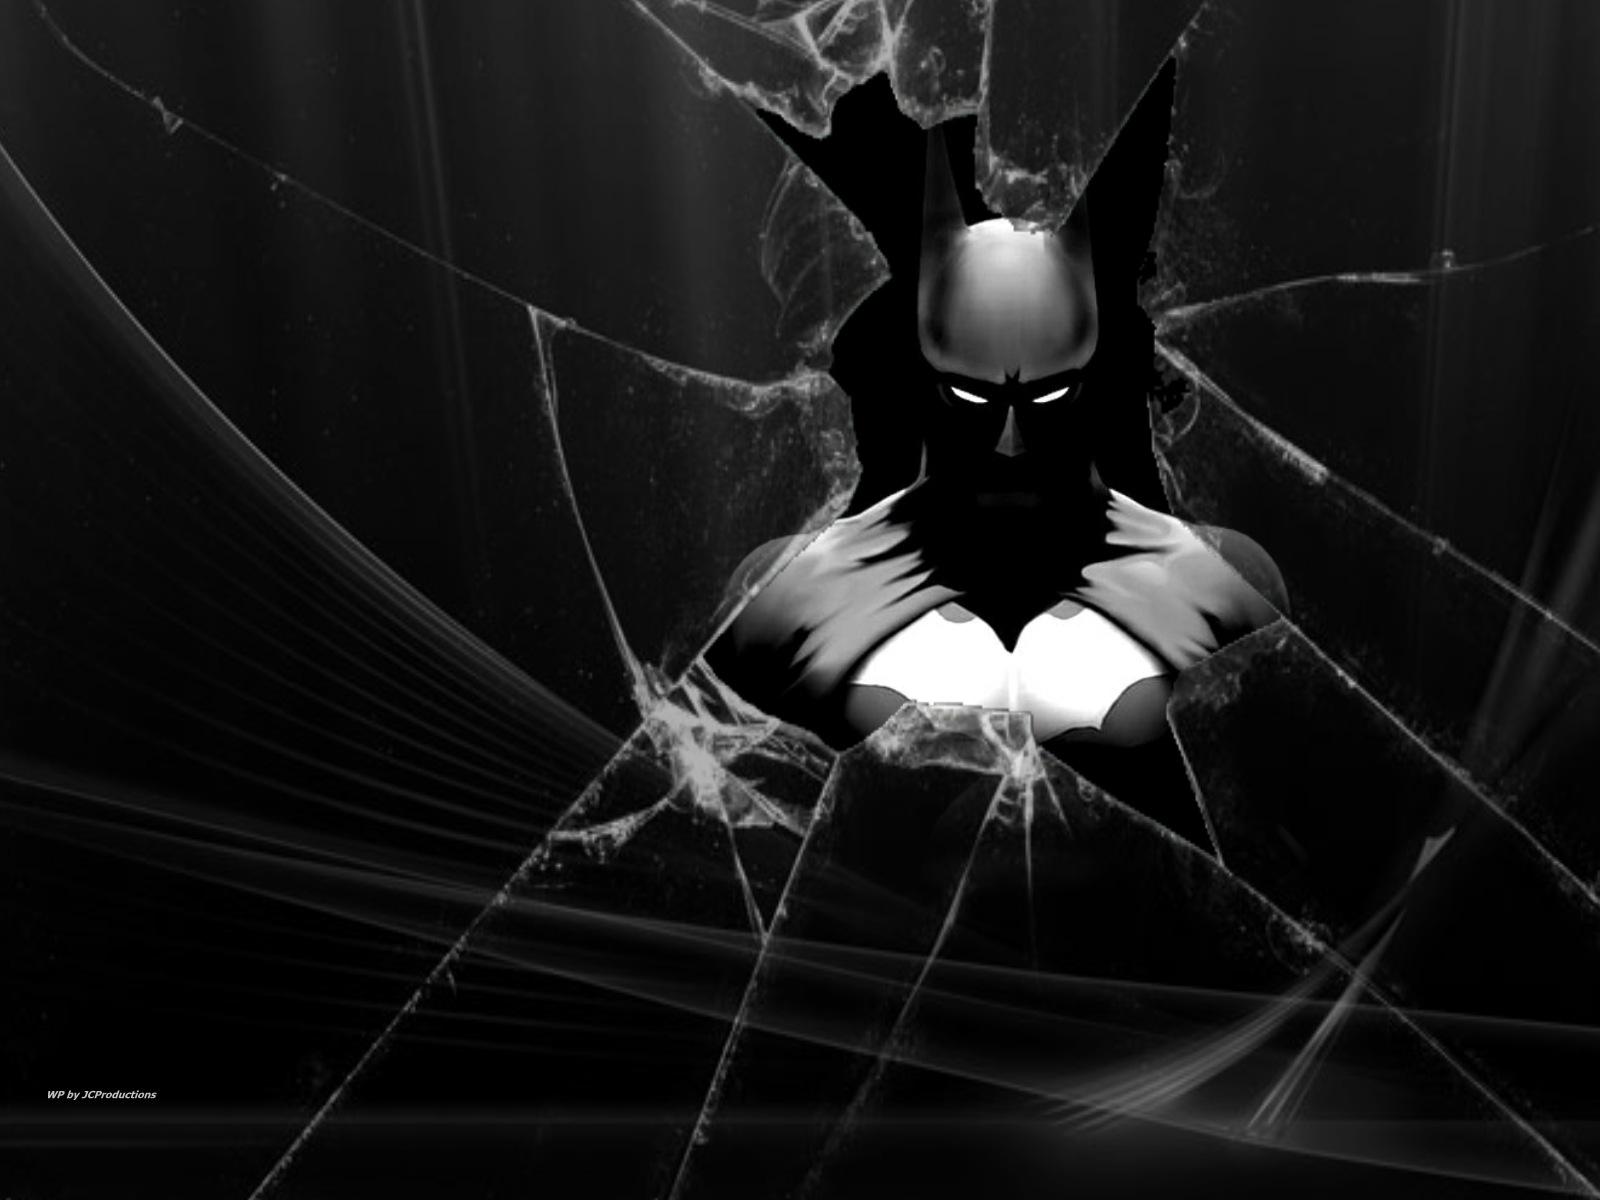 download high quality batman wallpapers batman bruce wayne joker gotham city